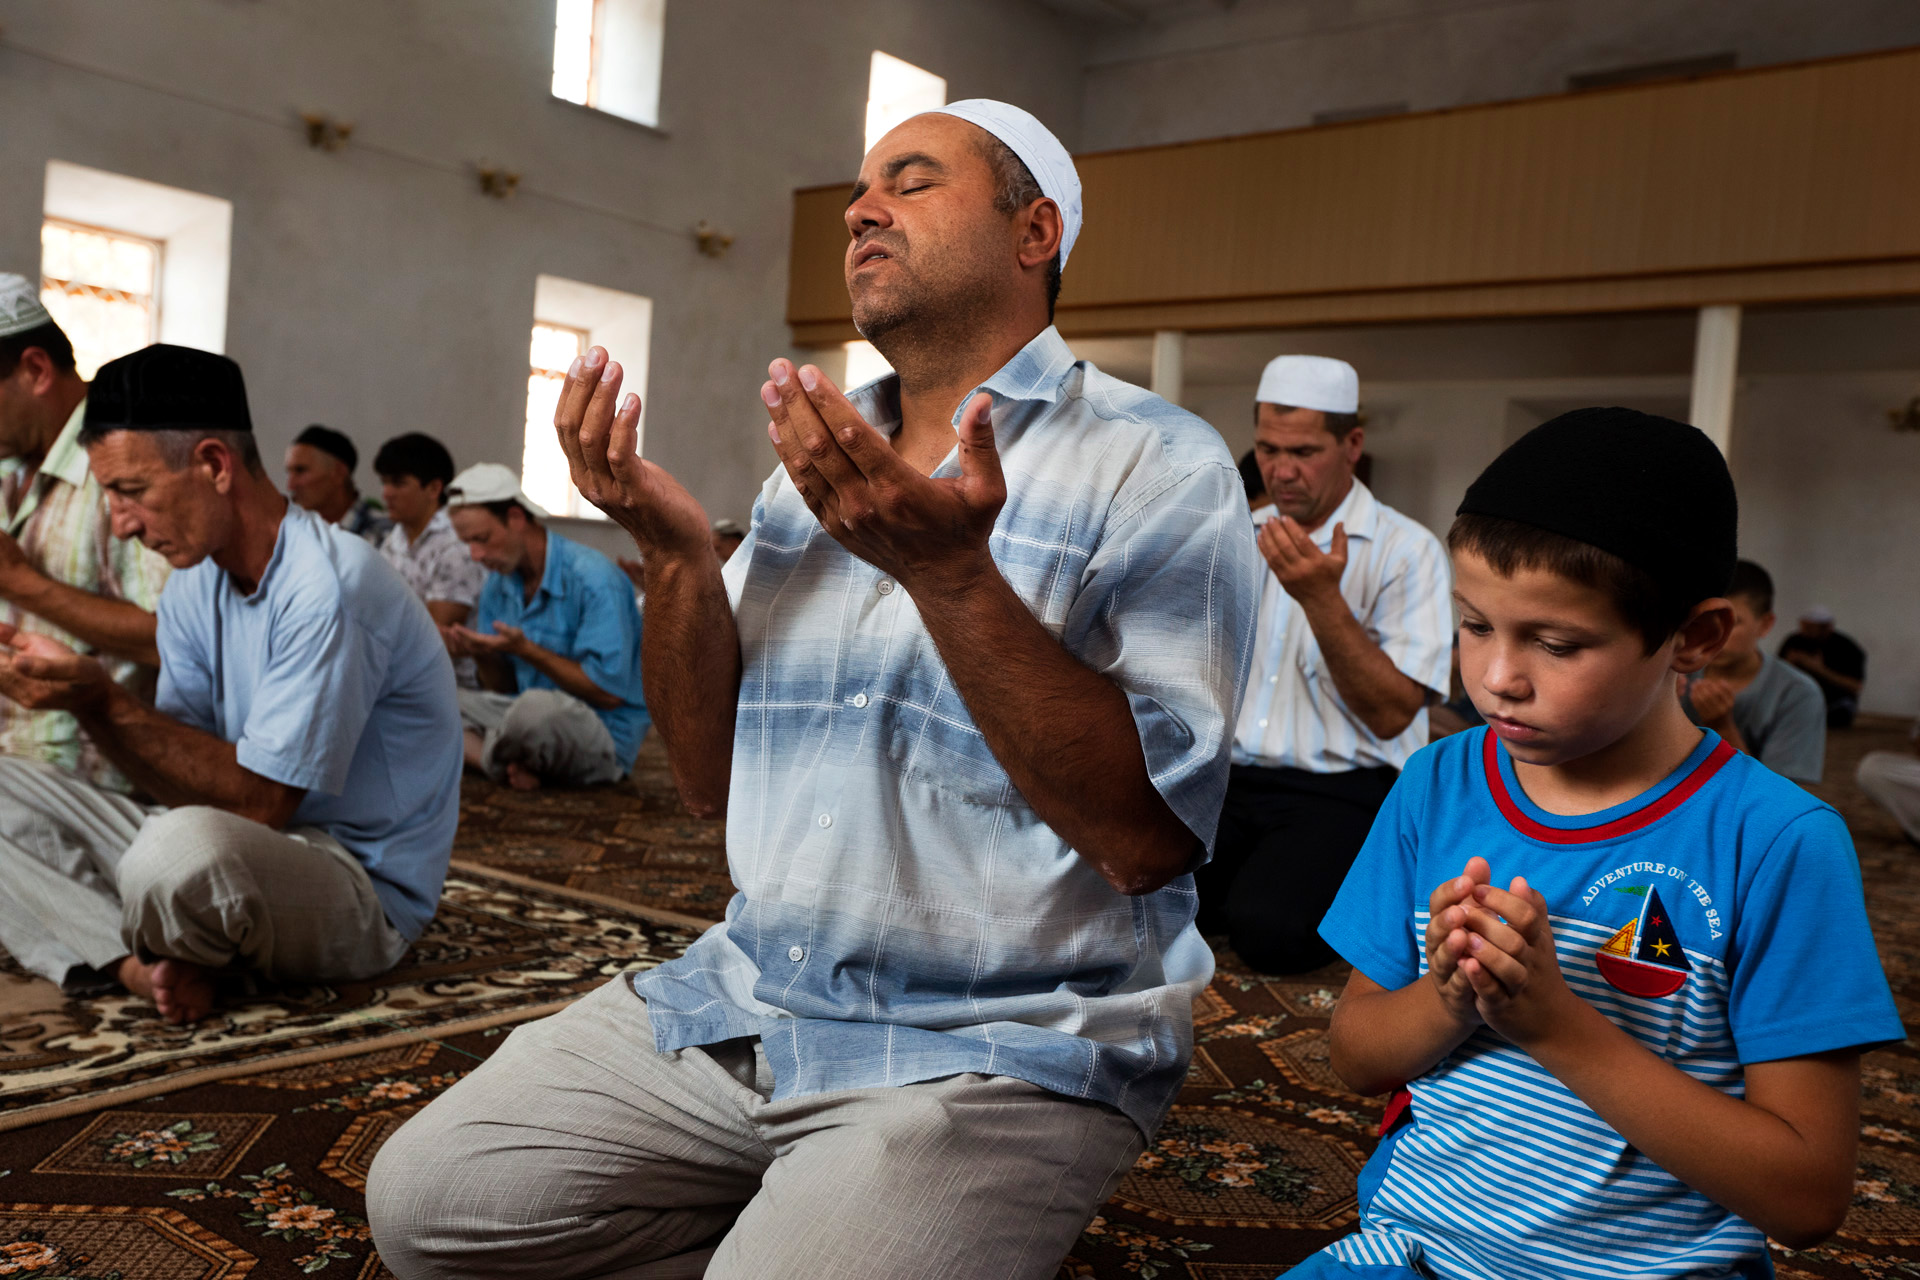 Friday prayers at the mosque in Dachnoe in Crimea, Ukraine.  Dachnoe, Crimea